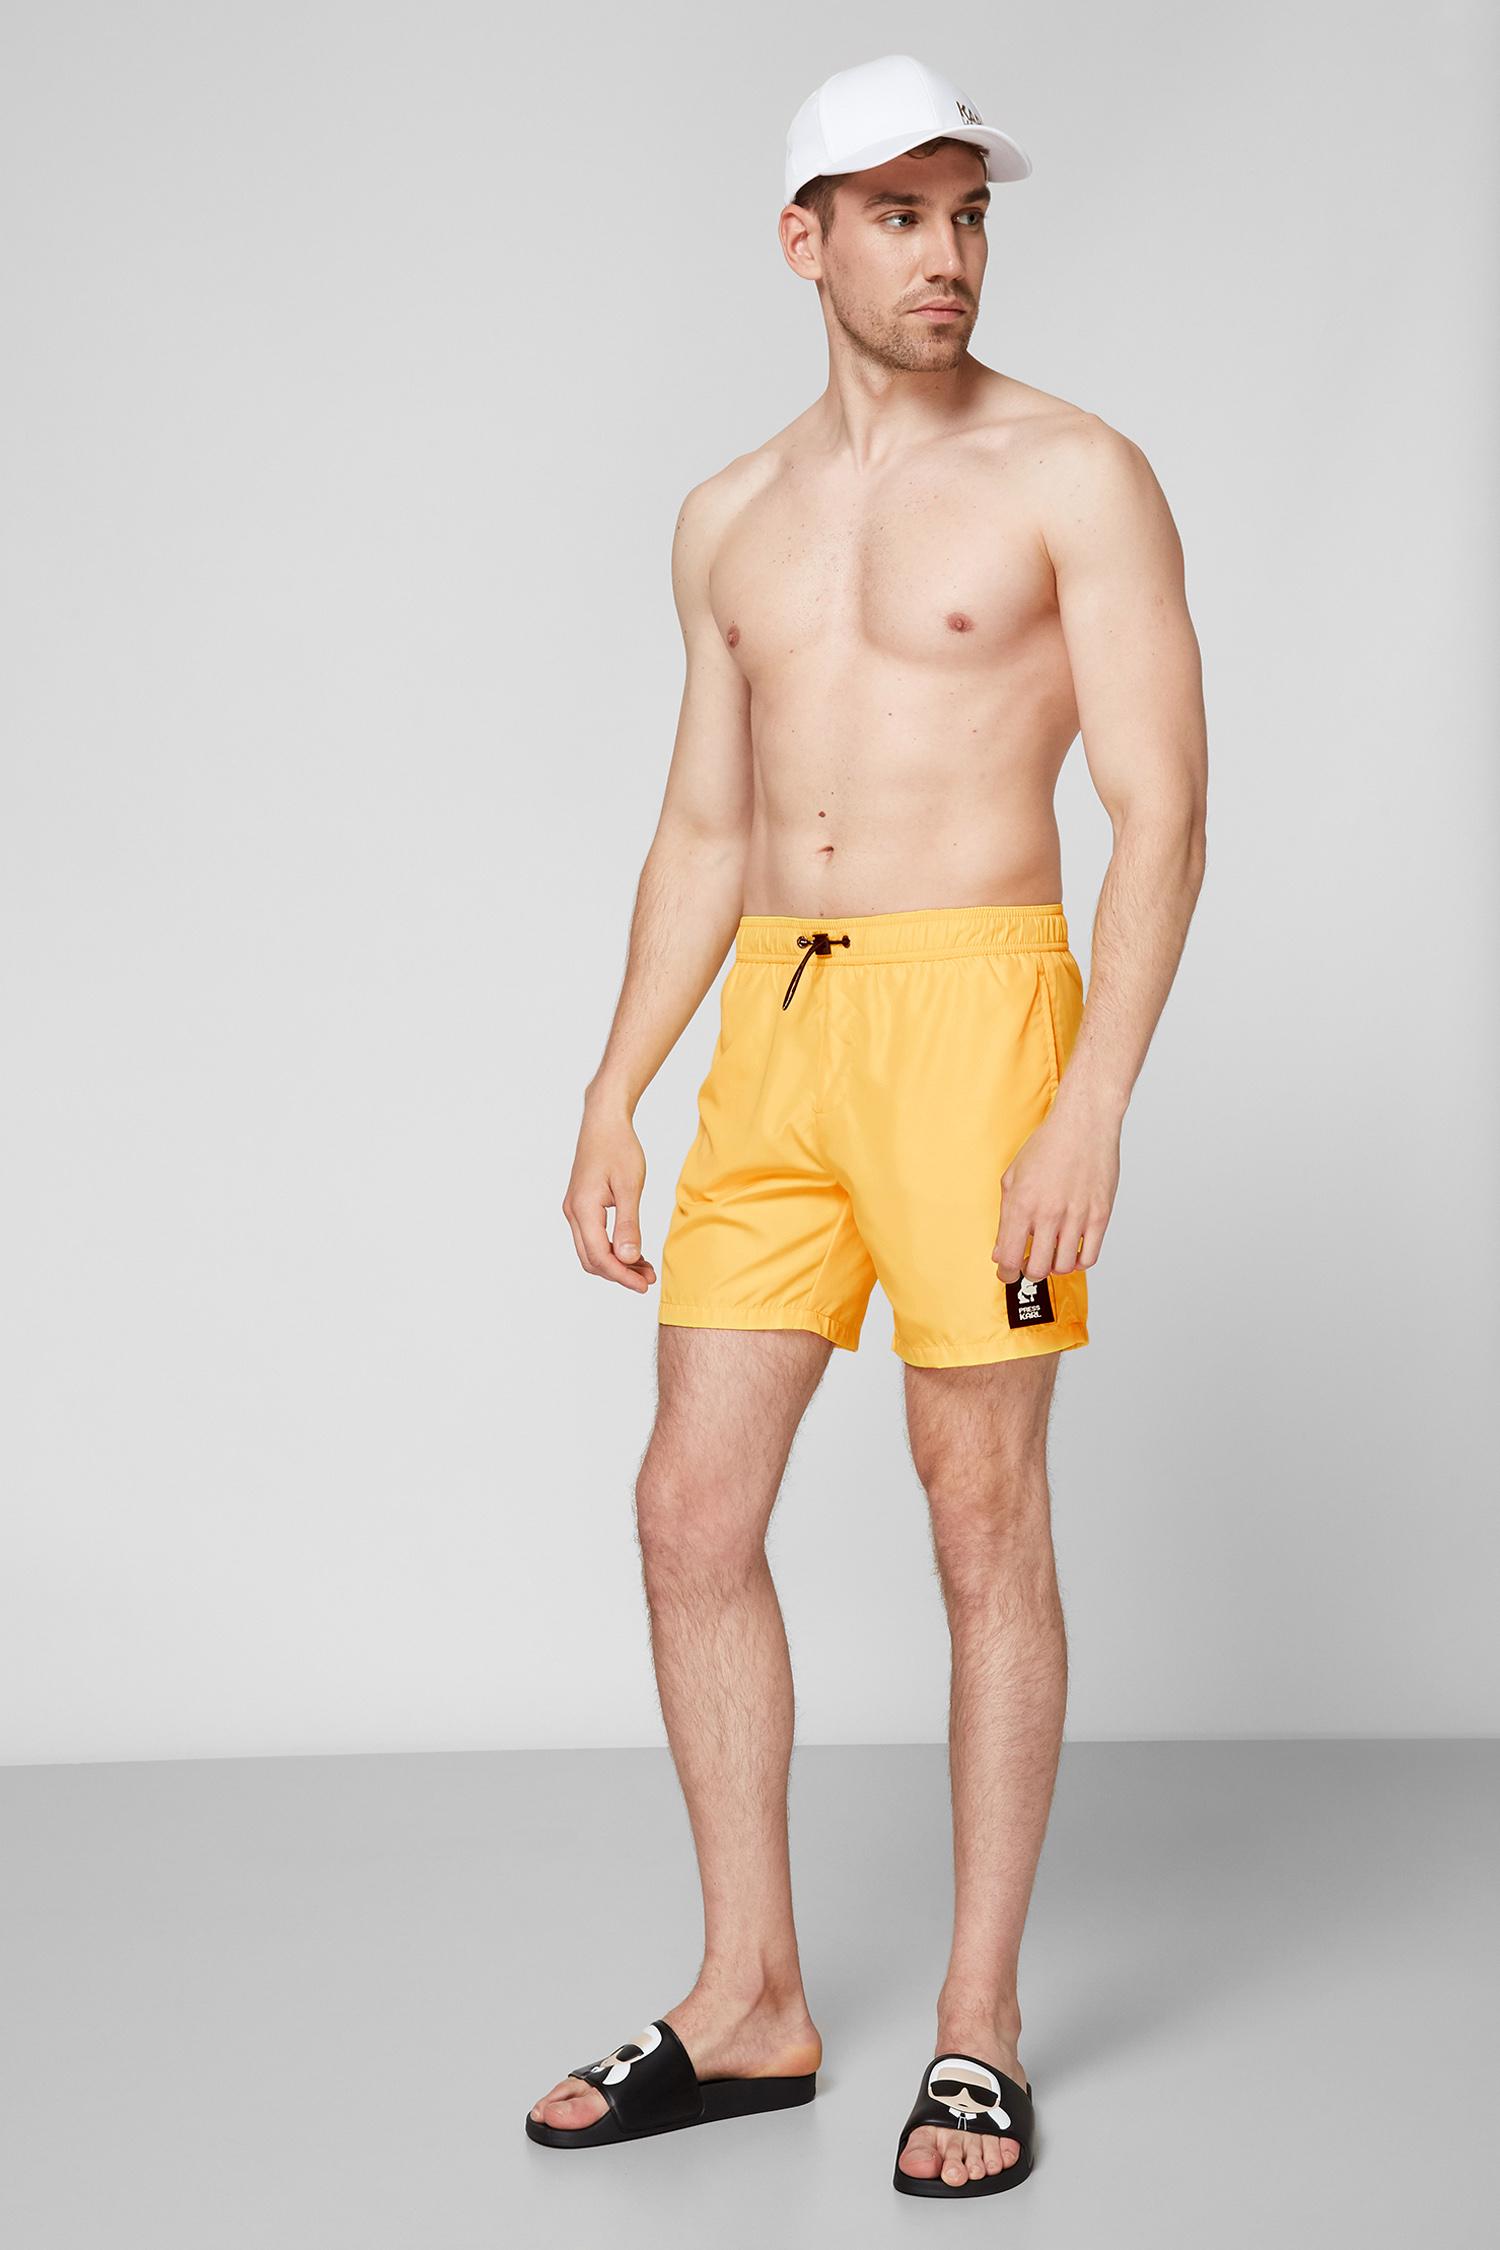 Мужские желтые плавательные шорты Karl Lagerfeld KL21MBM01;YELLOW